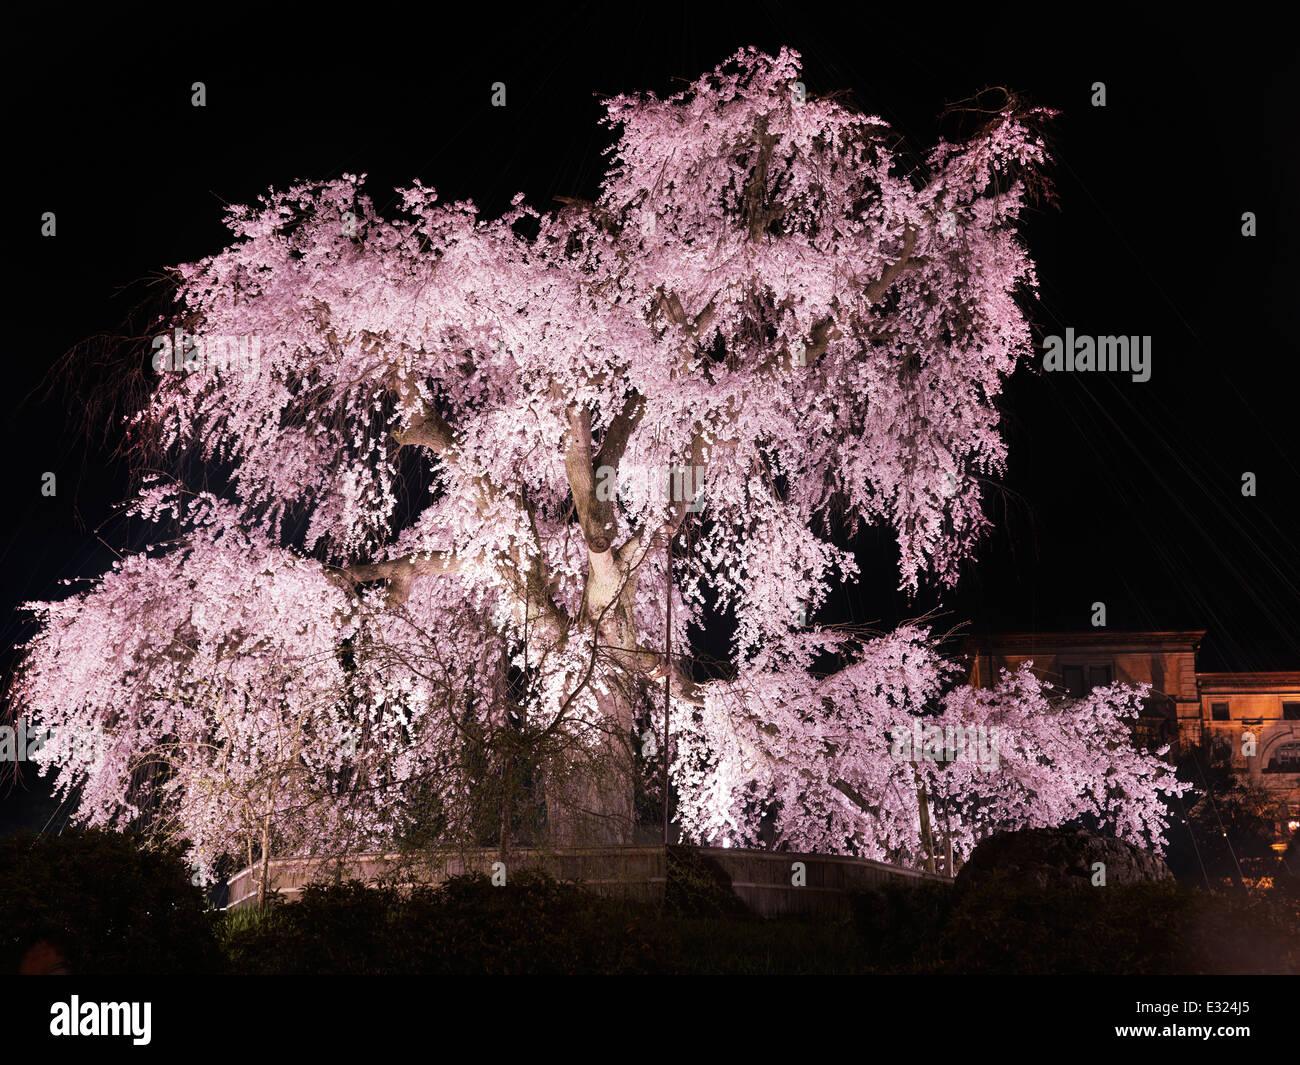 Viejo cerezo llorón, shidarezakura, iluminado en la noche en Maruyama park, Gion, Kioto, Japón 2014 Imagen De Stock